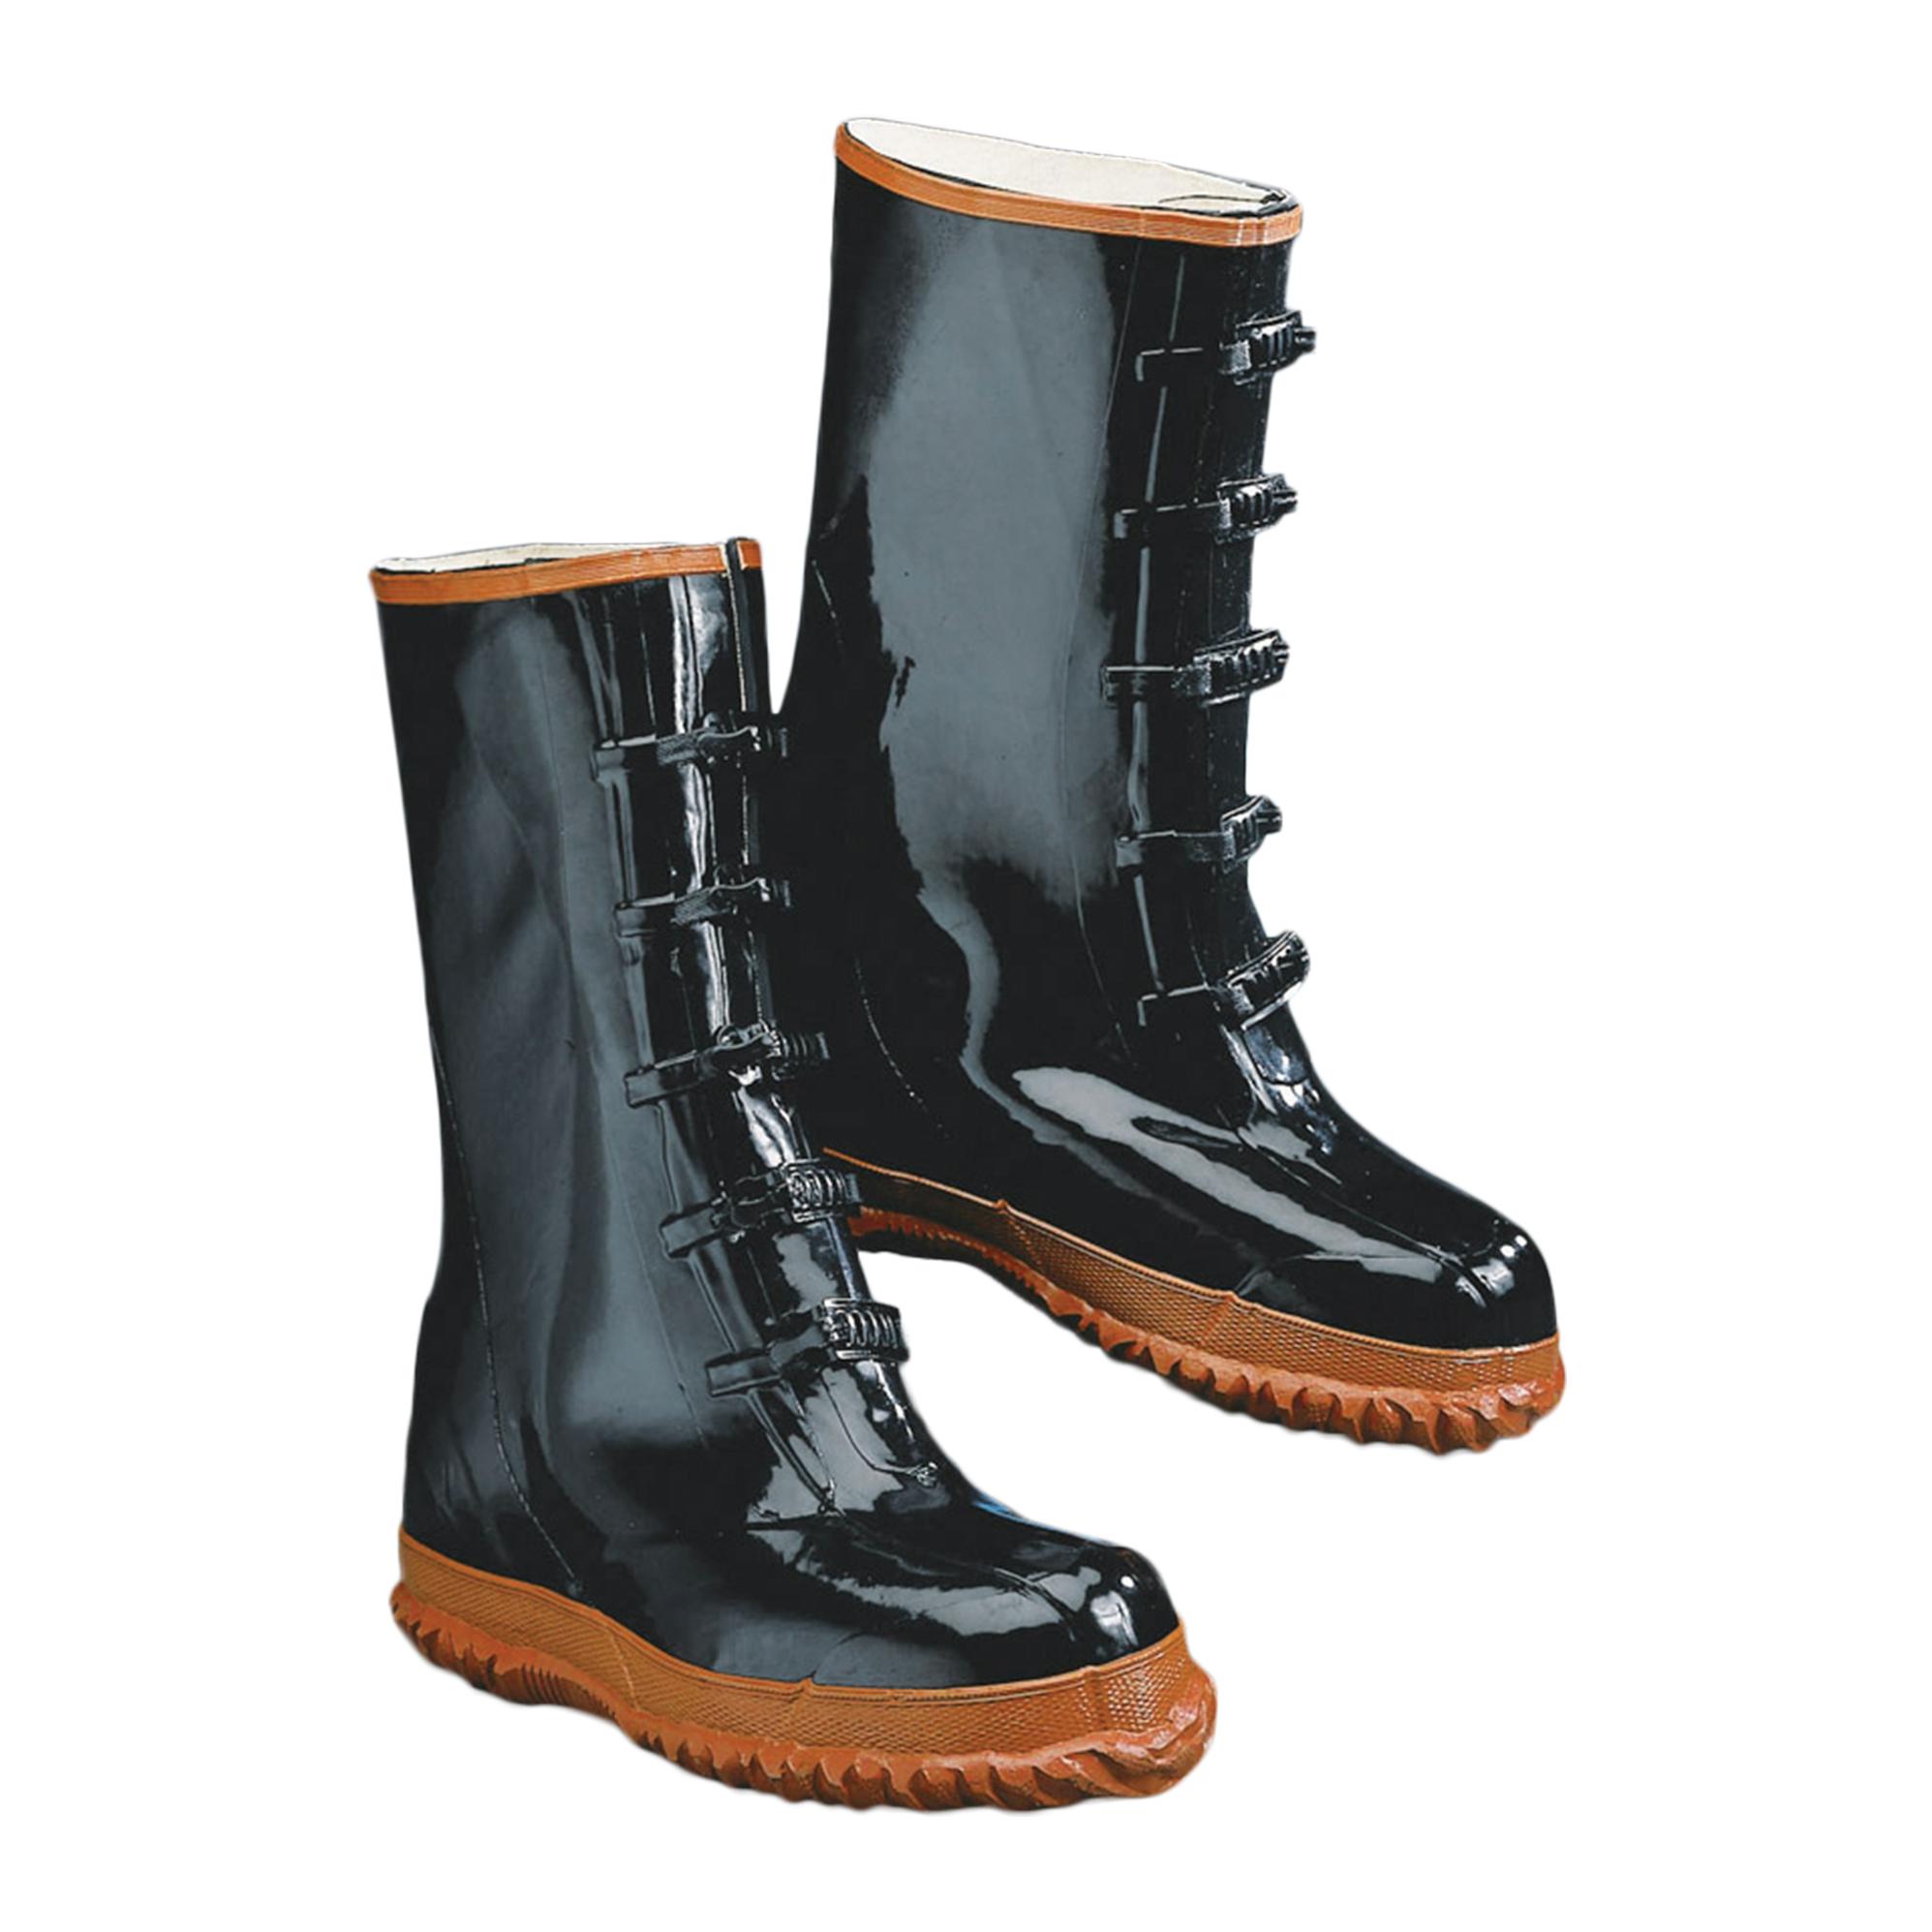 Five-Buckle Artic Rubber Boots-2W International